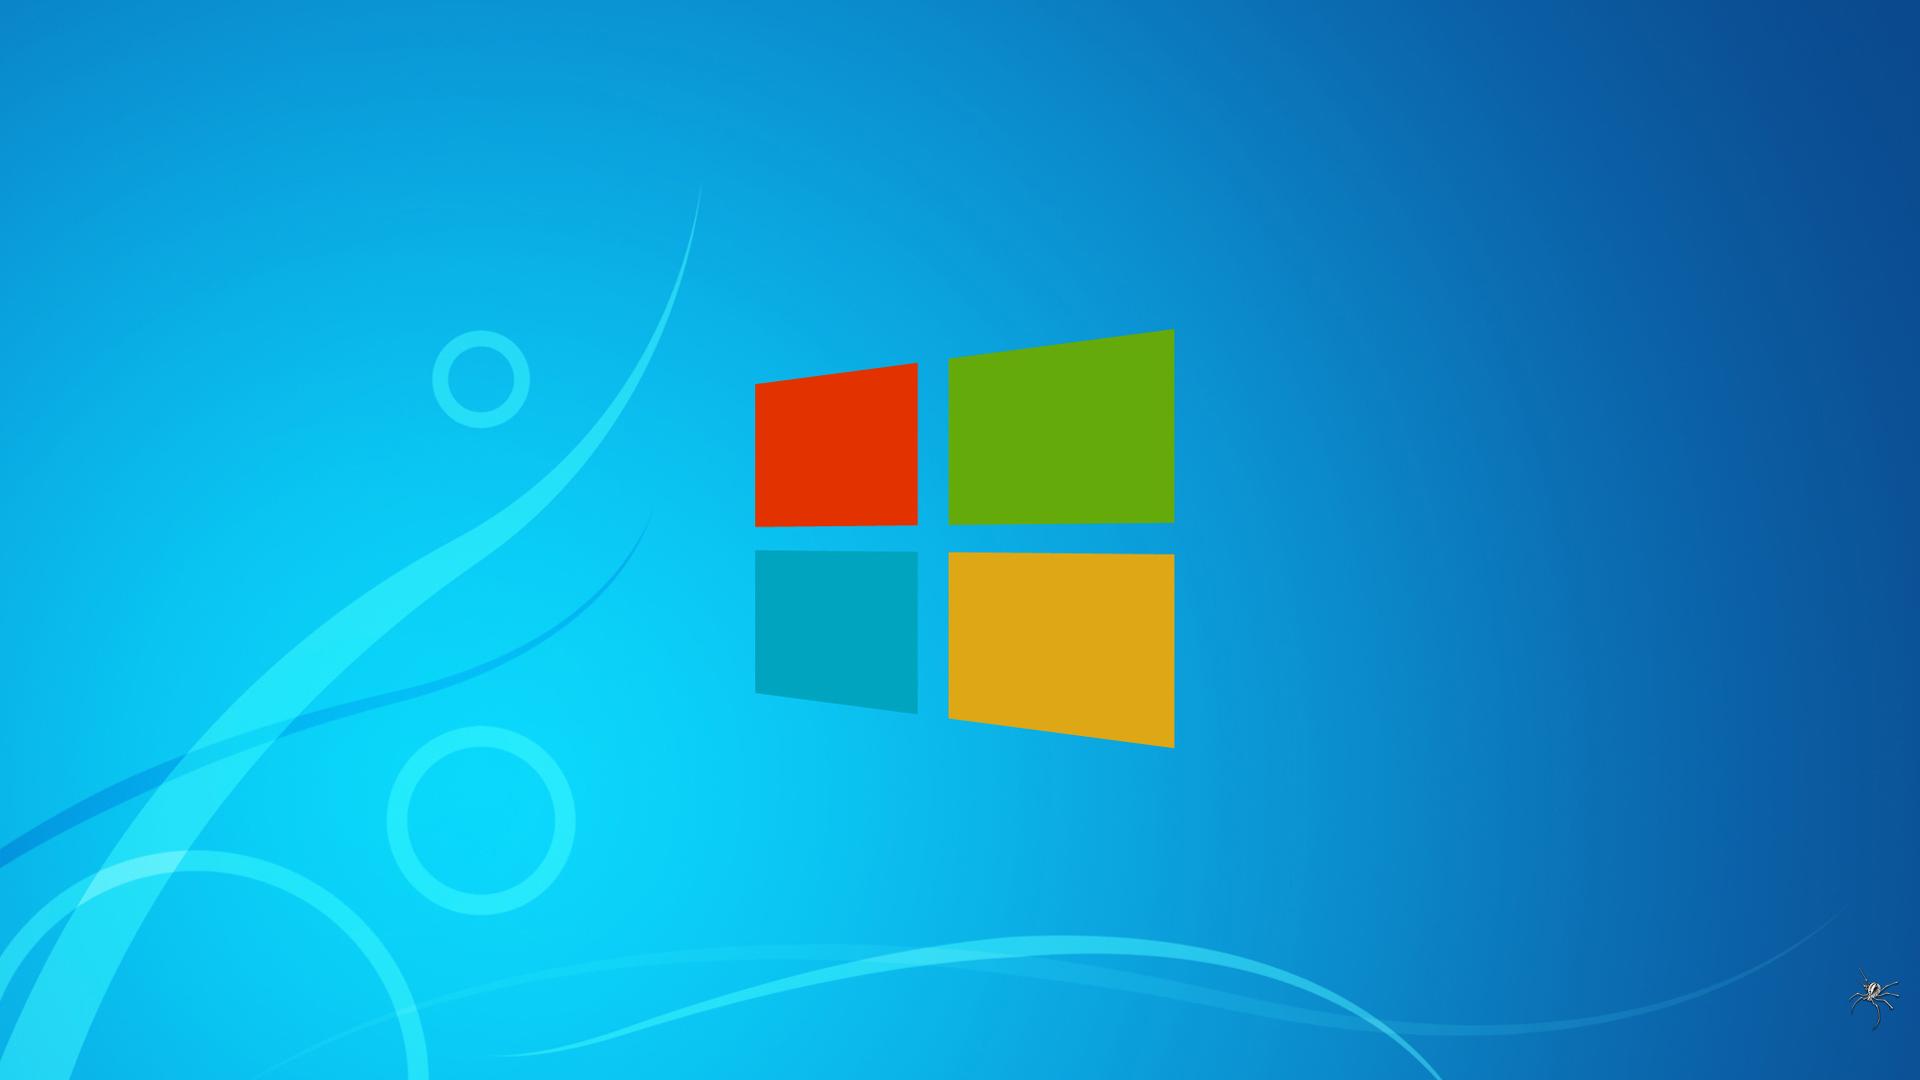 Amazing Wallpaper High Quality Windows 8 - ziE918  Image_464579.jpg